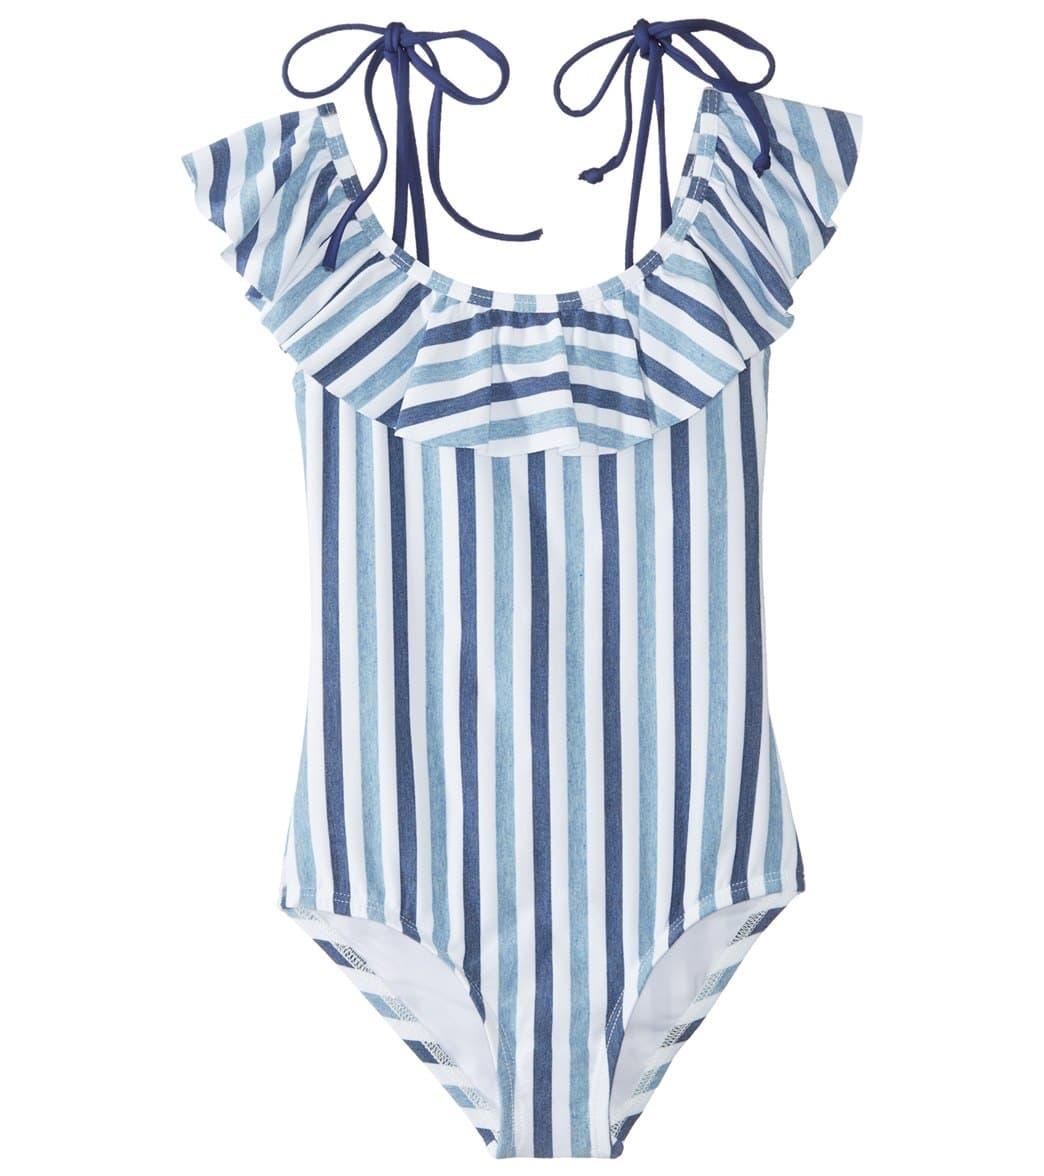 7aac44bde987 Splendid Girls' Tie Dye Stripe Ruffle One Piece Swimsuit (Big Kid) at  SwimOutlet.com - Free Shipping